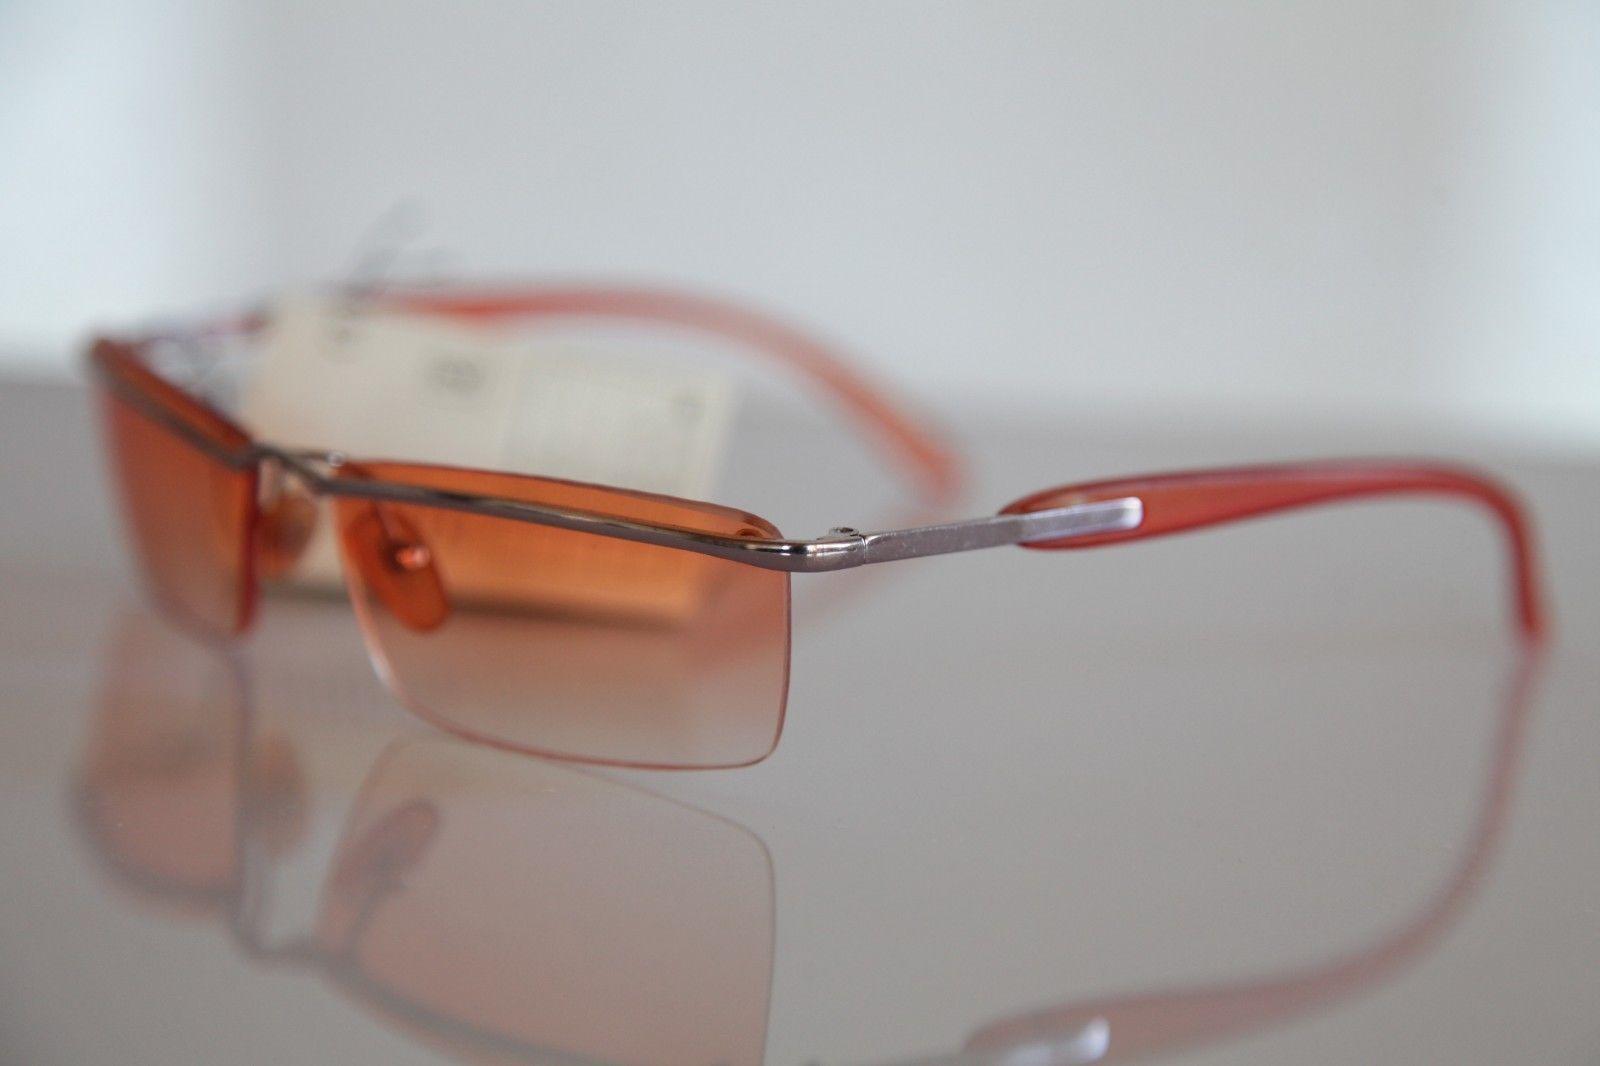 Rimless Glasses Nz : Chrome Rimless Frame, Smoke Orange, Orange lenses - Sunglasses